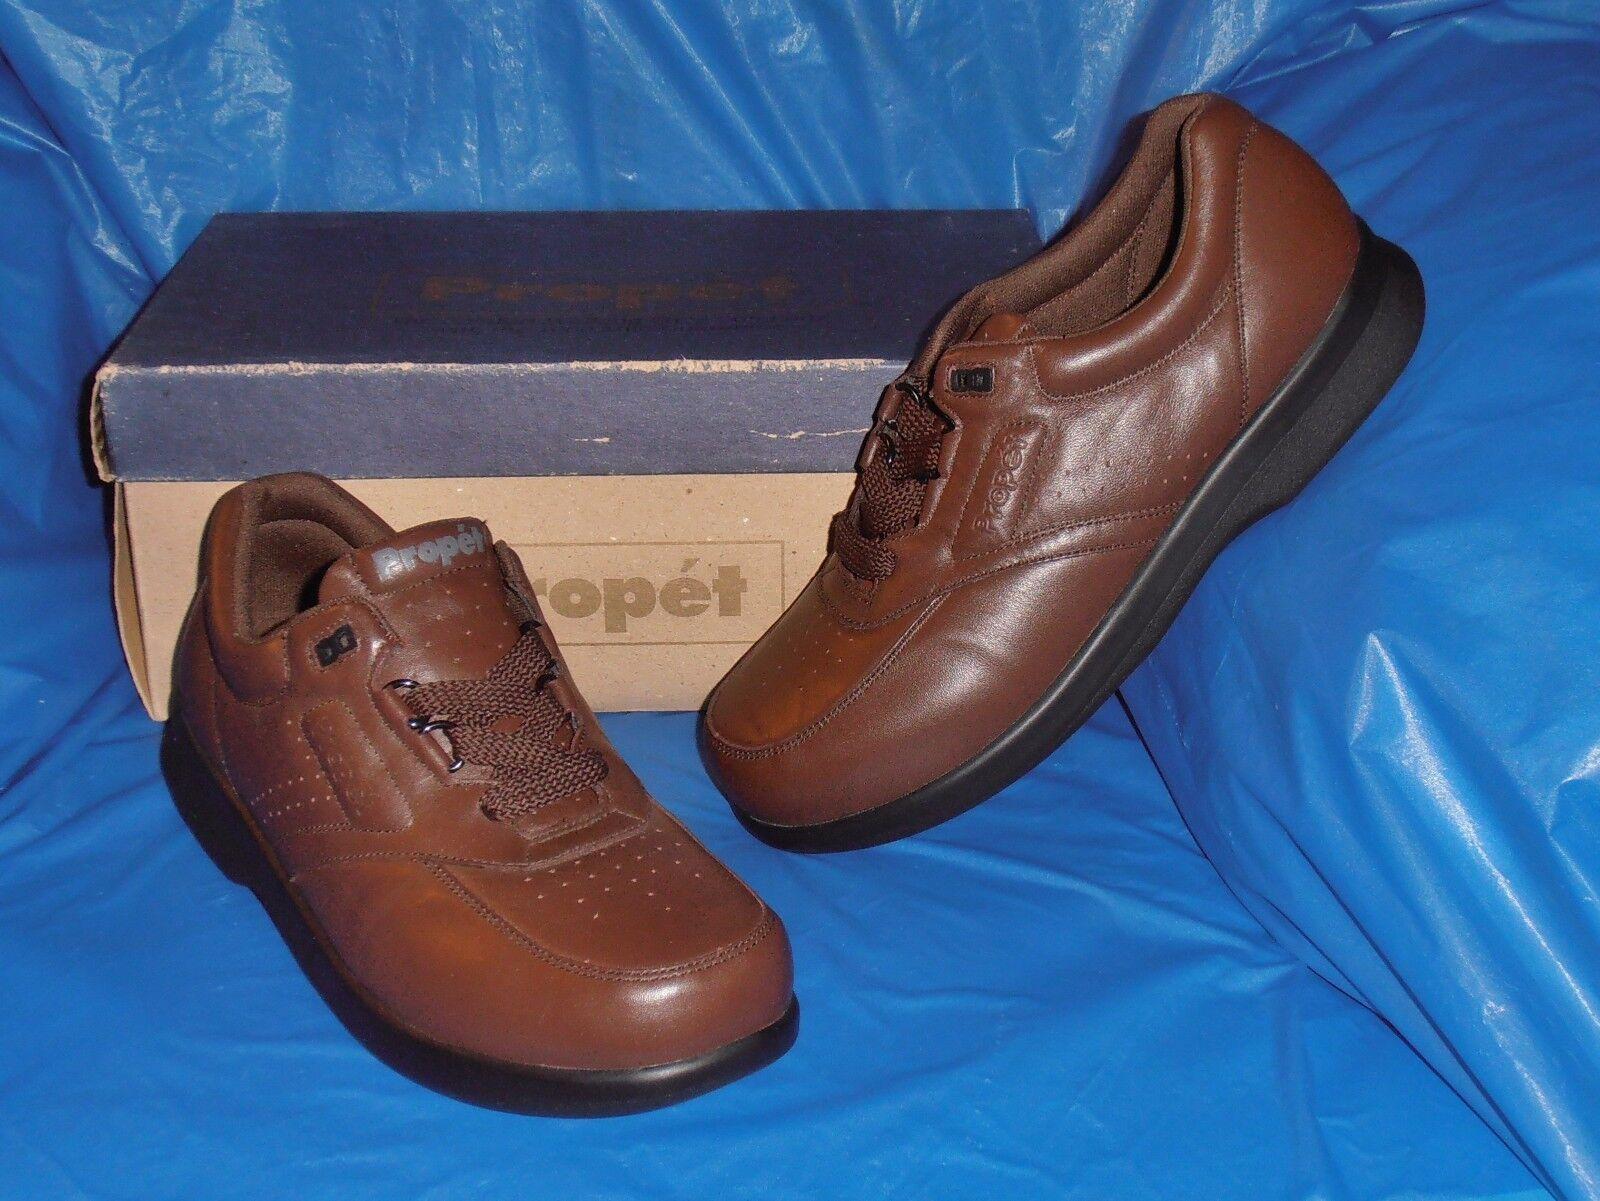 Propet, Uomo Brown Lite Comfort Walking shoe. 16 EE